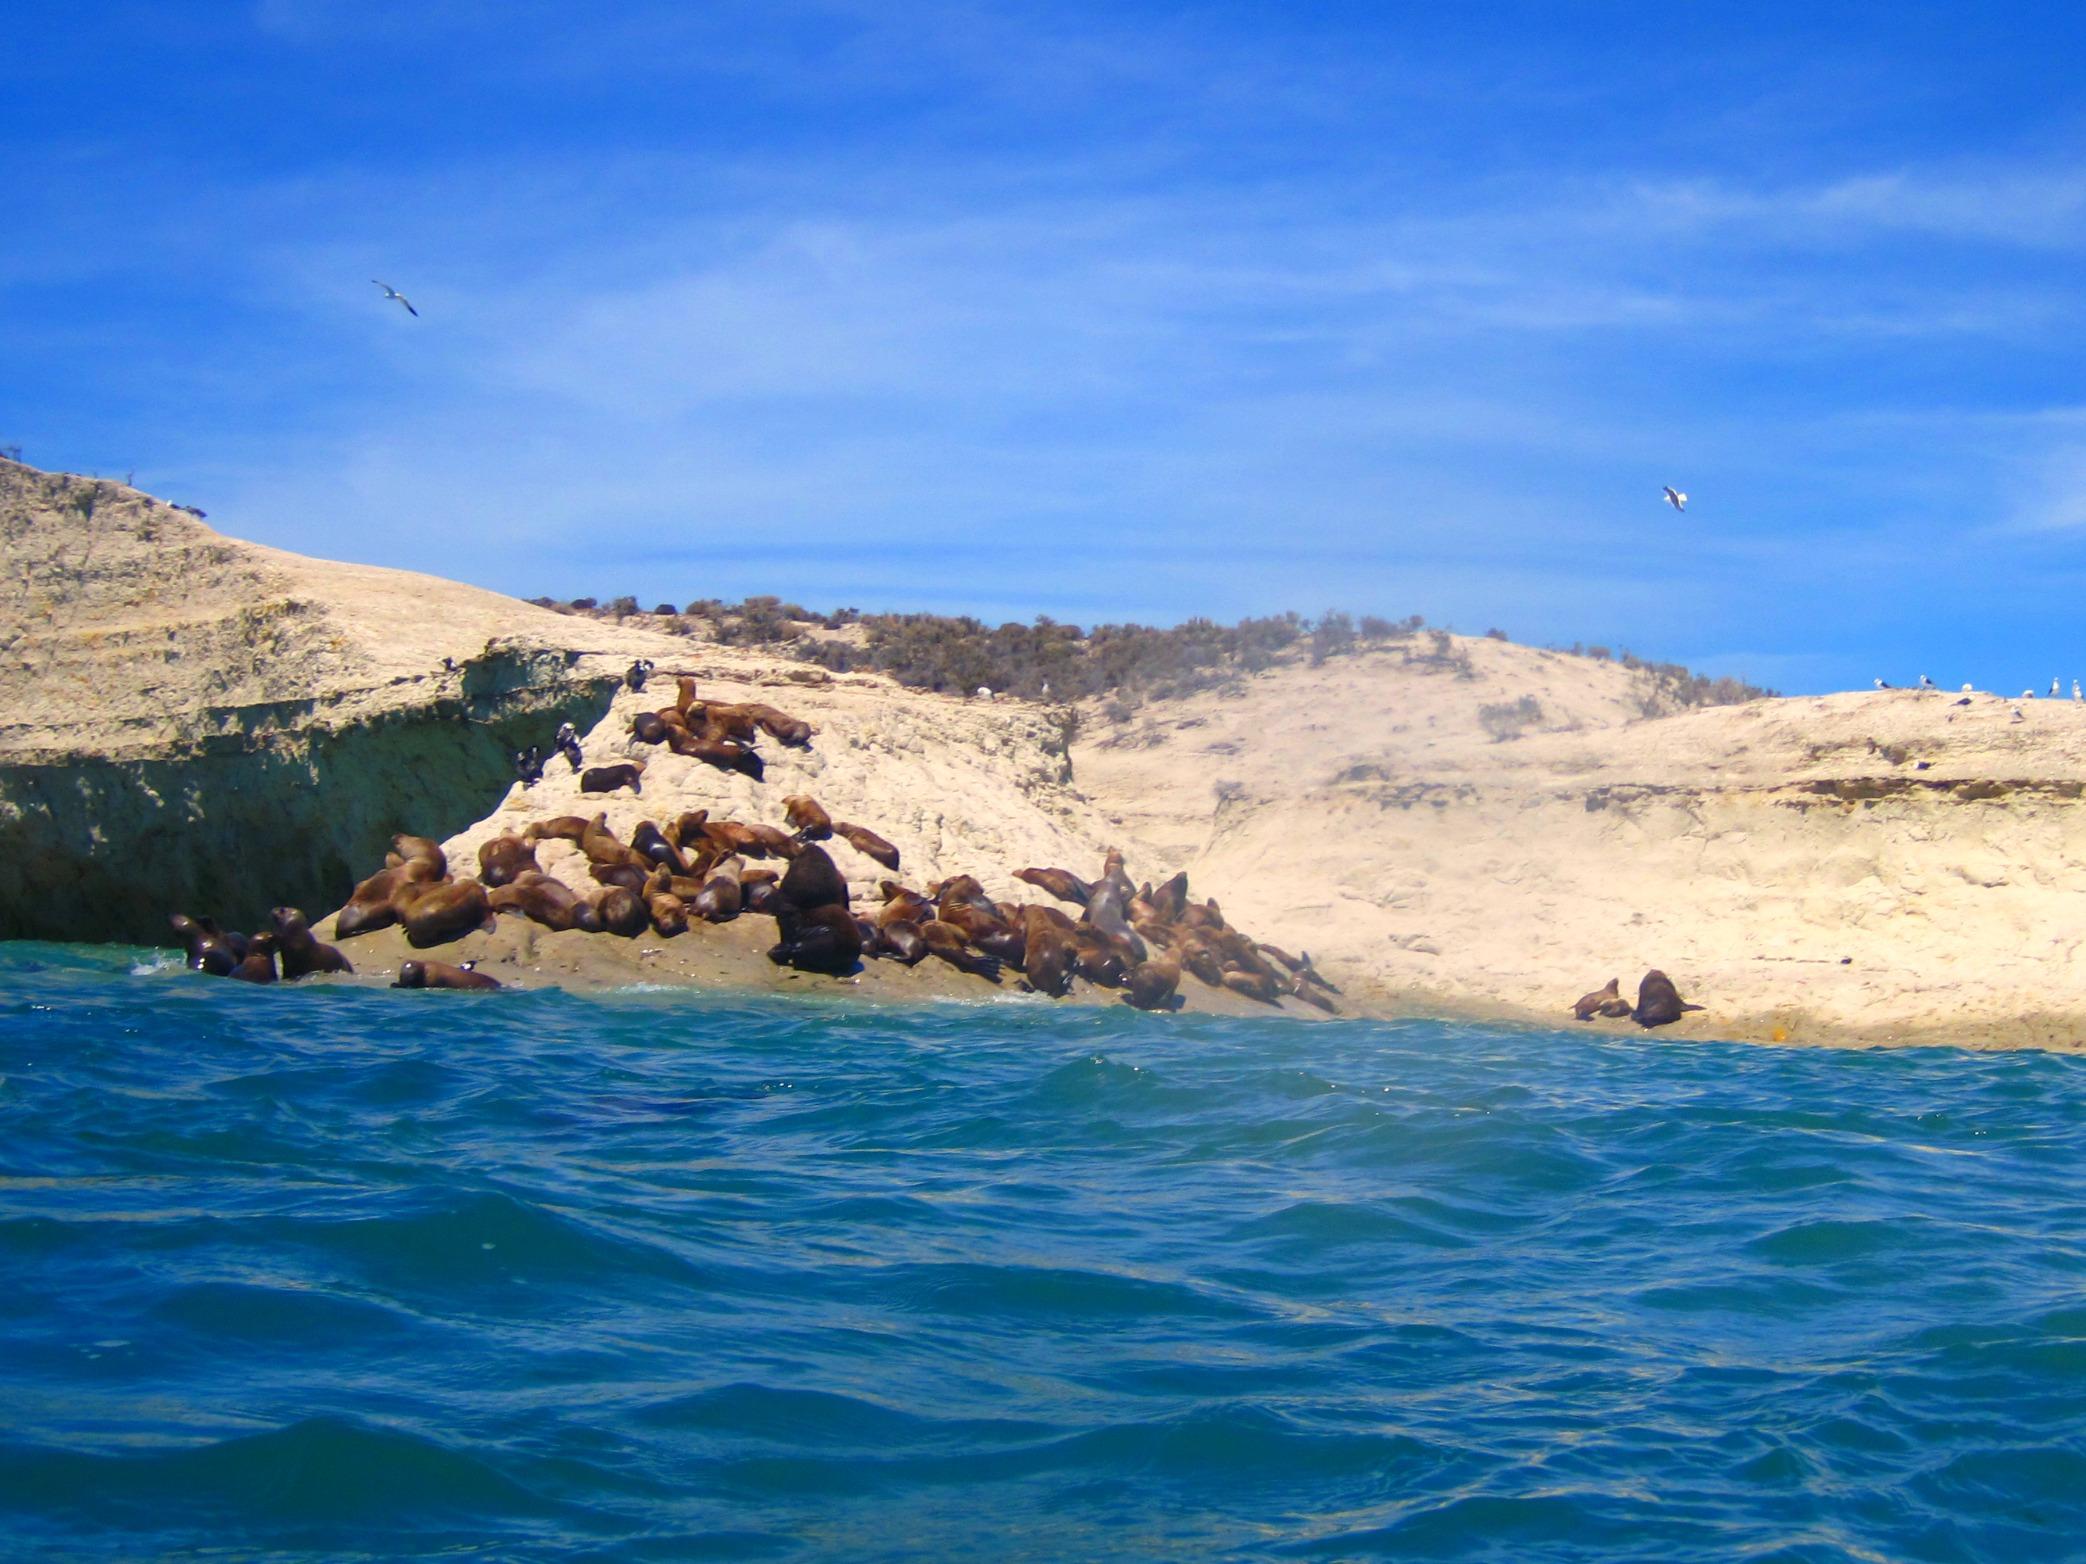 foto zeeleeuwen